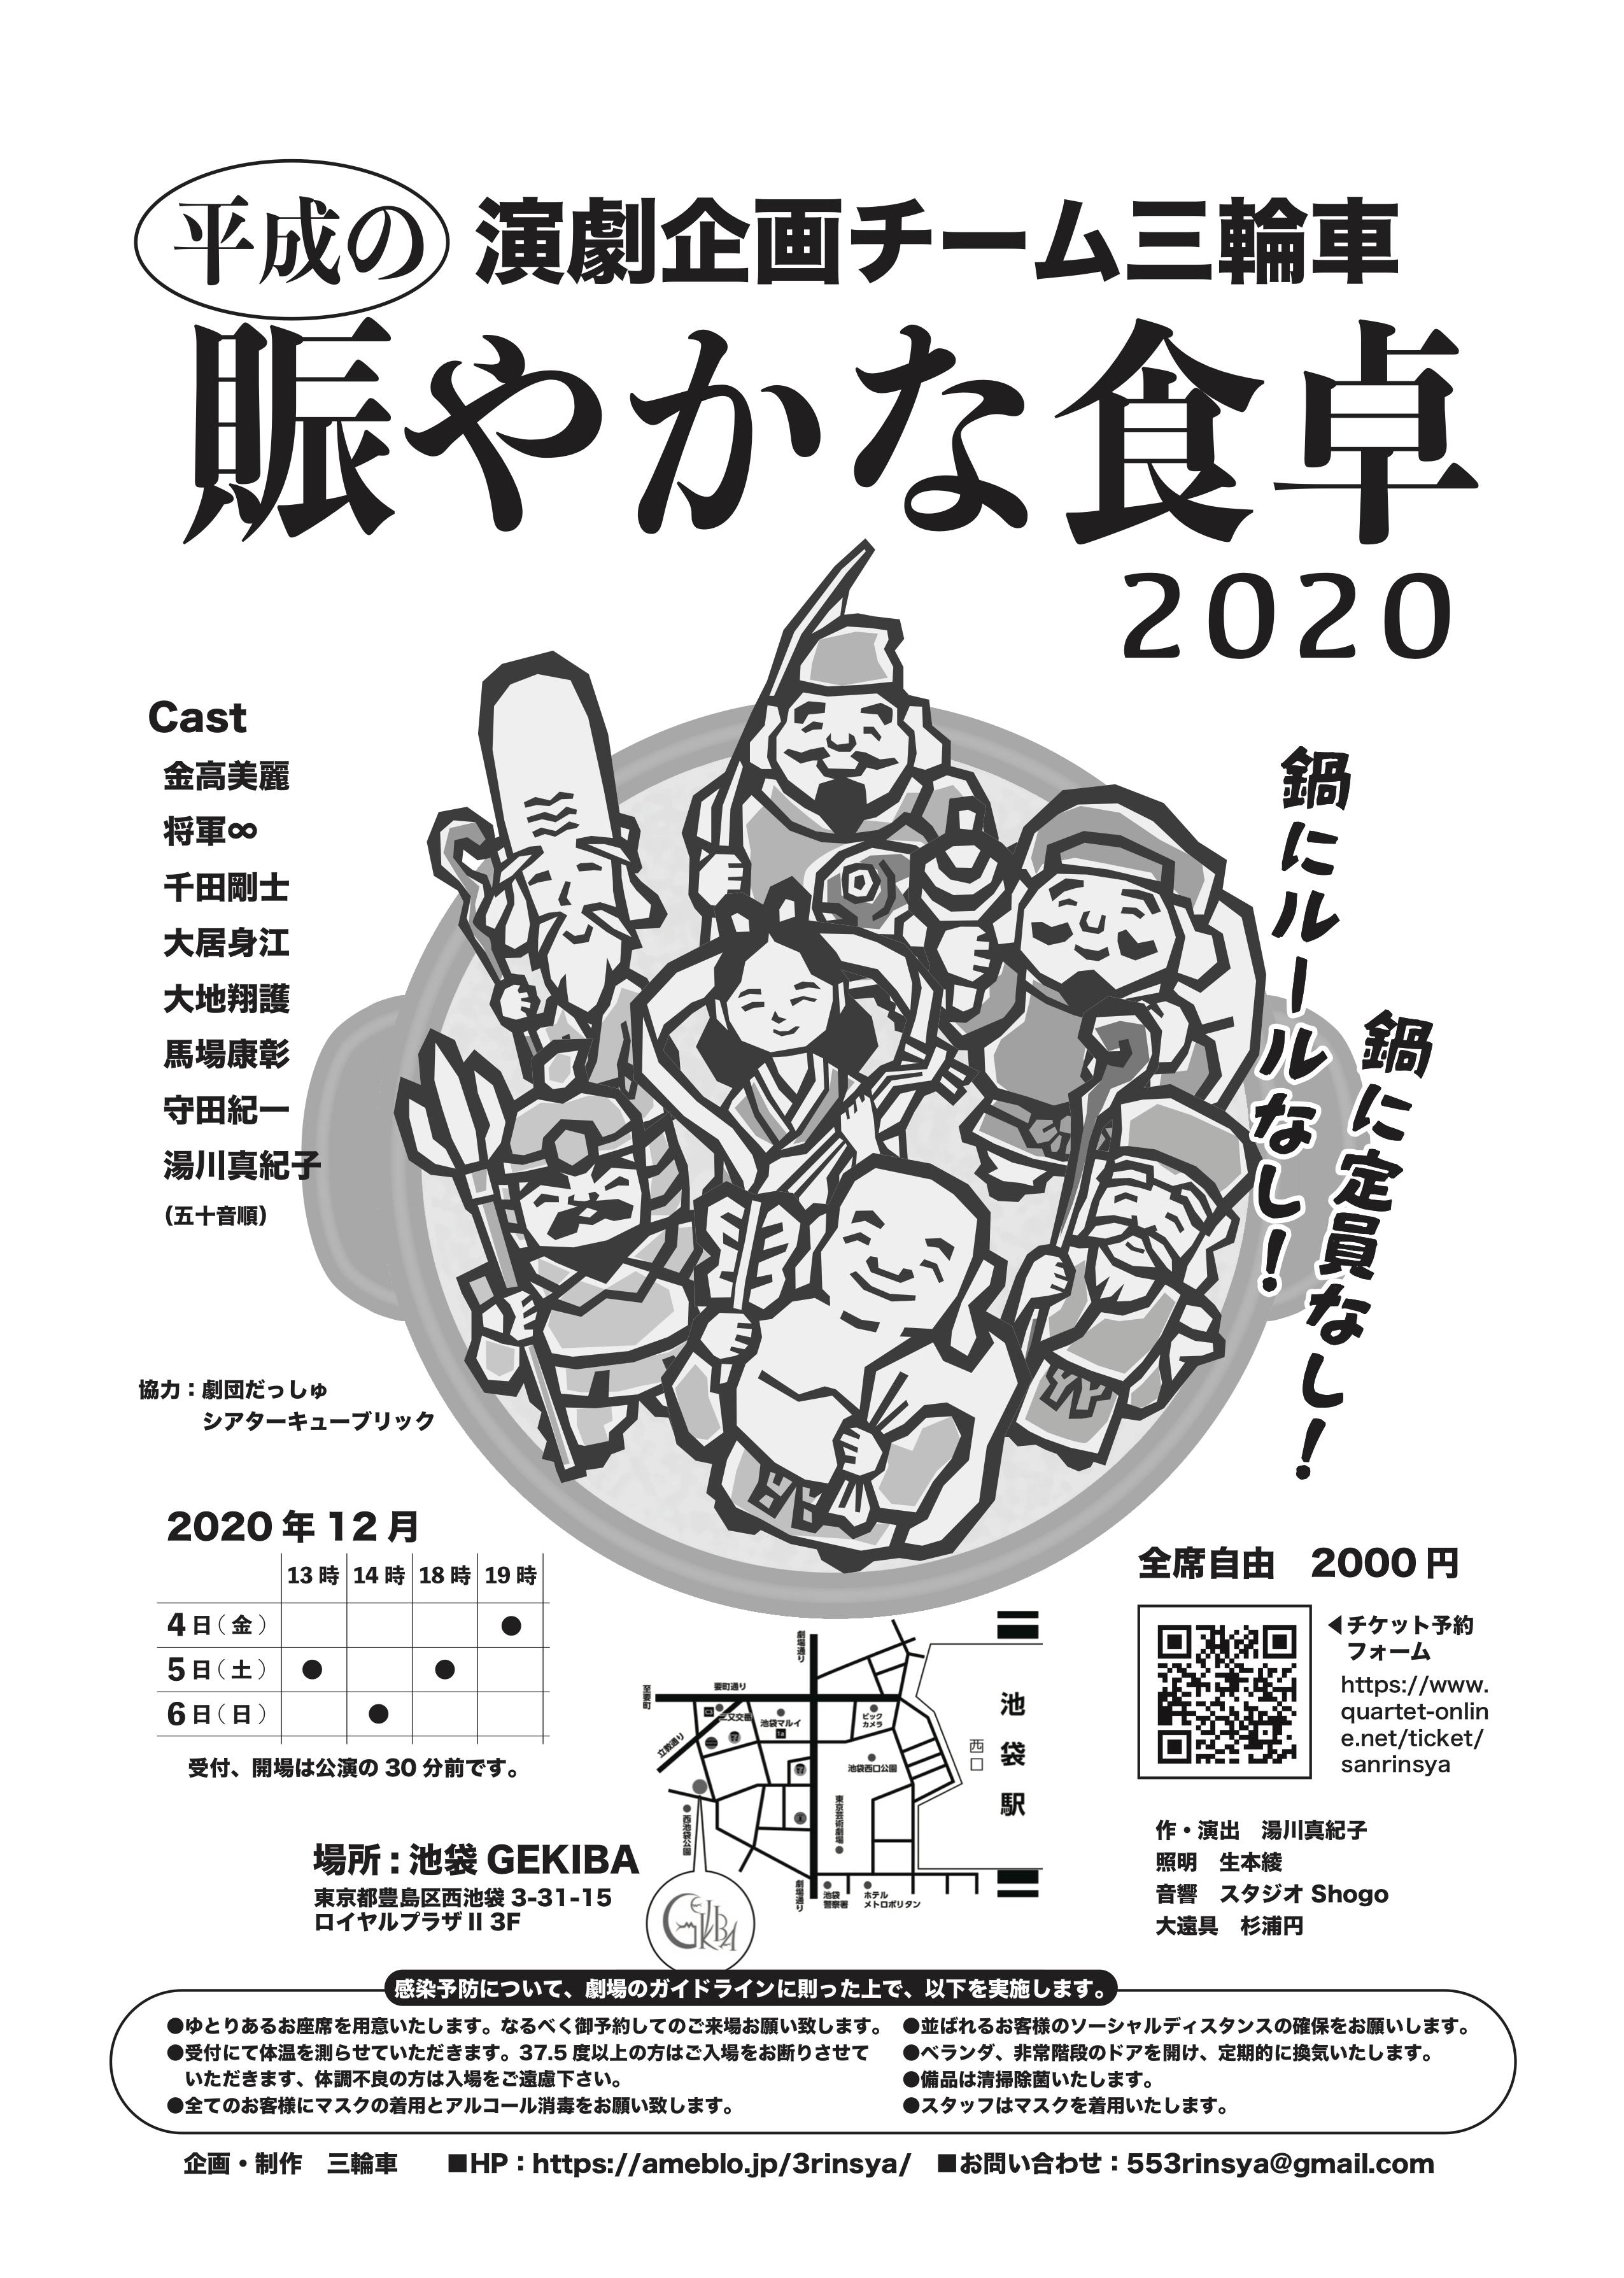 https://qublic.net/sanrinsya_syokutaku2020.jpg